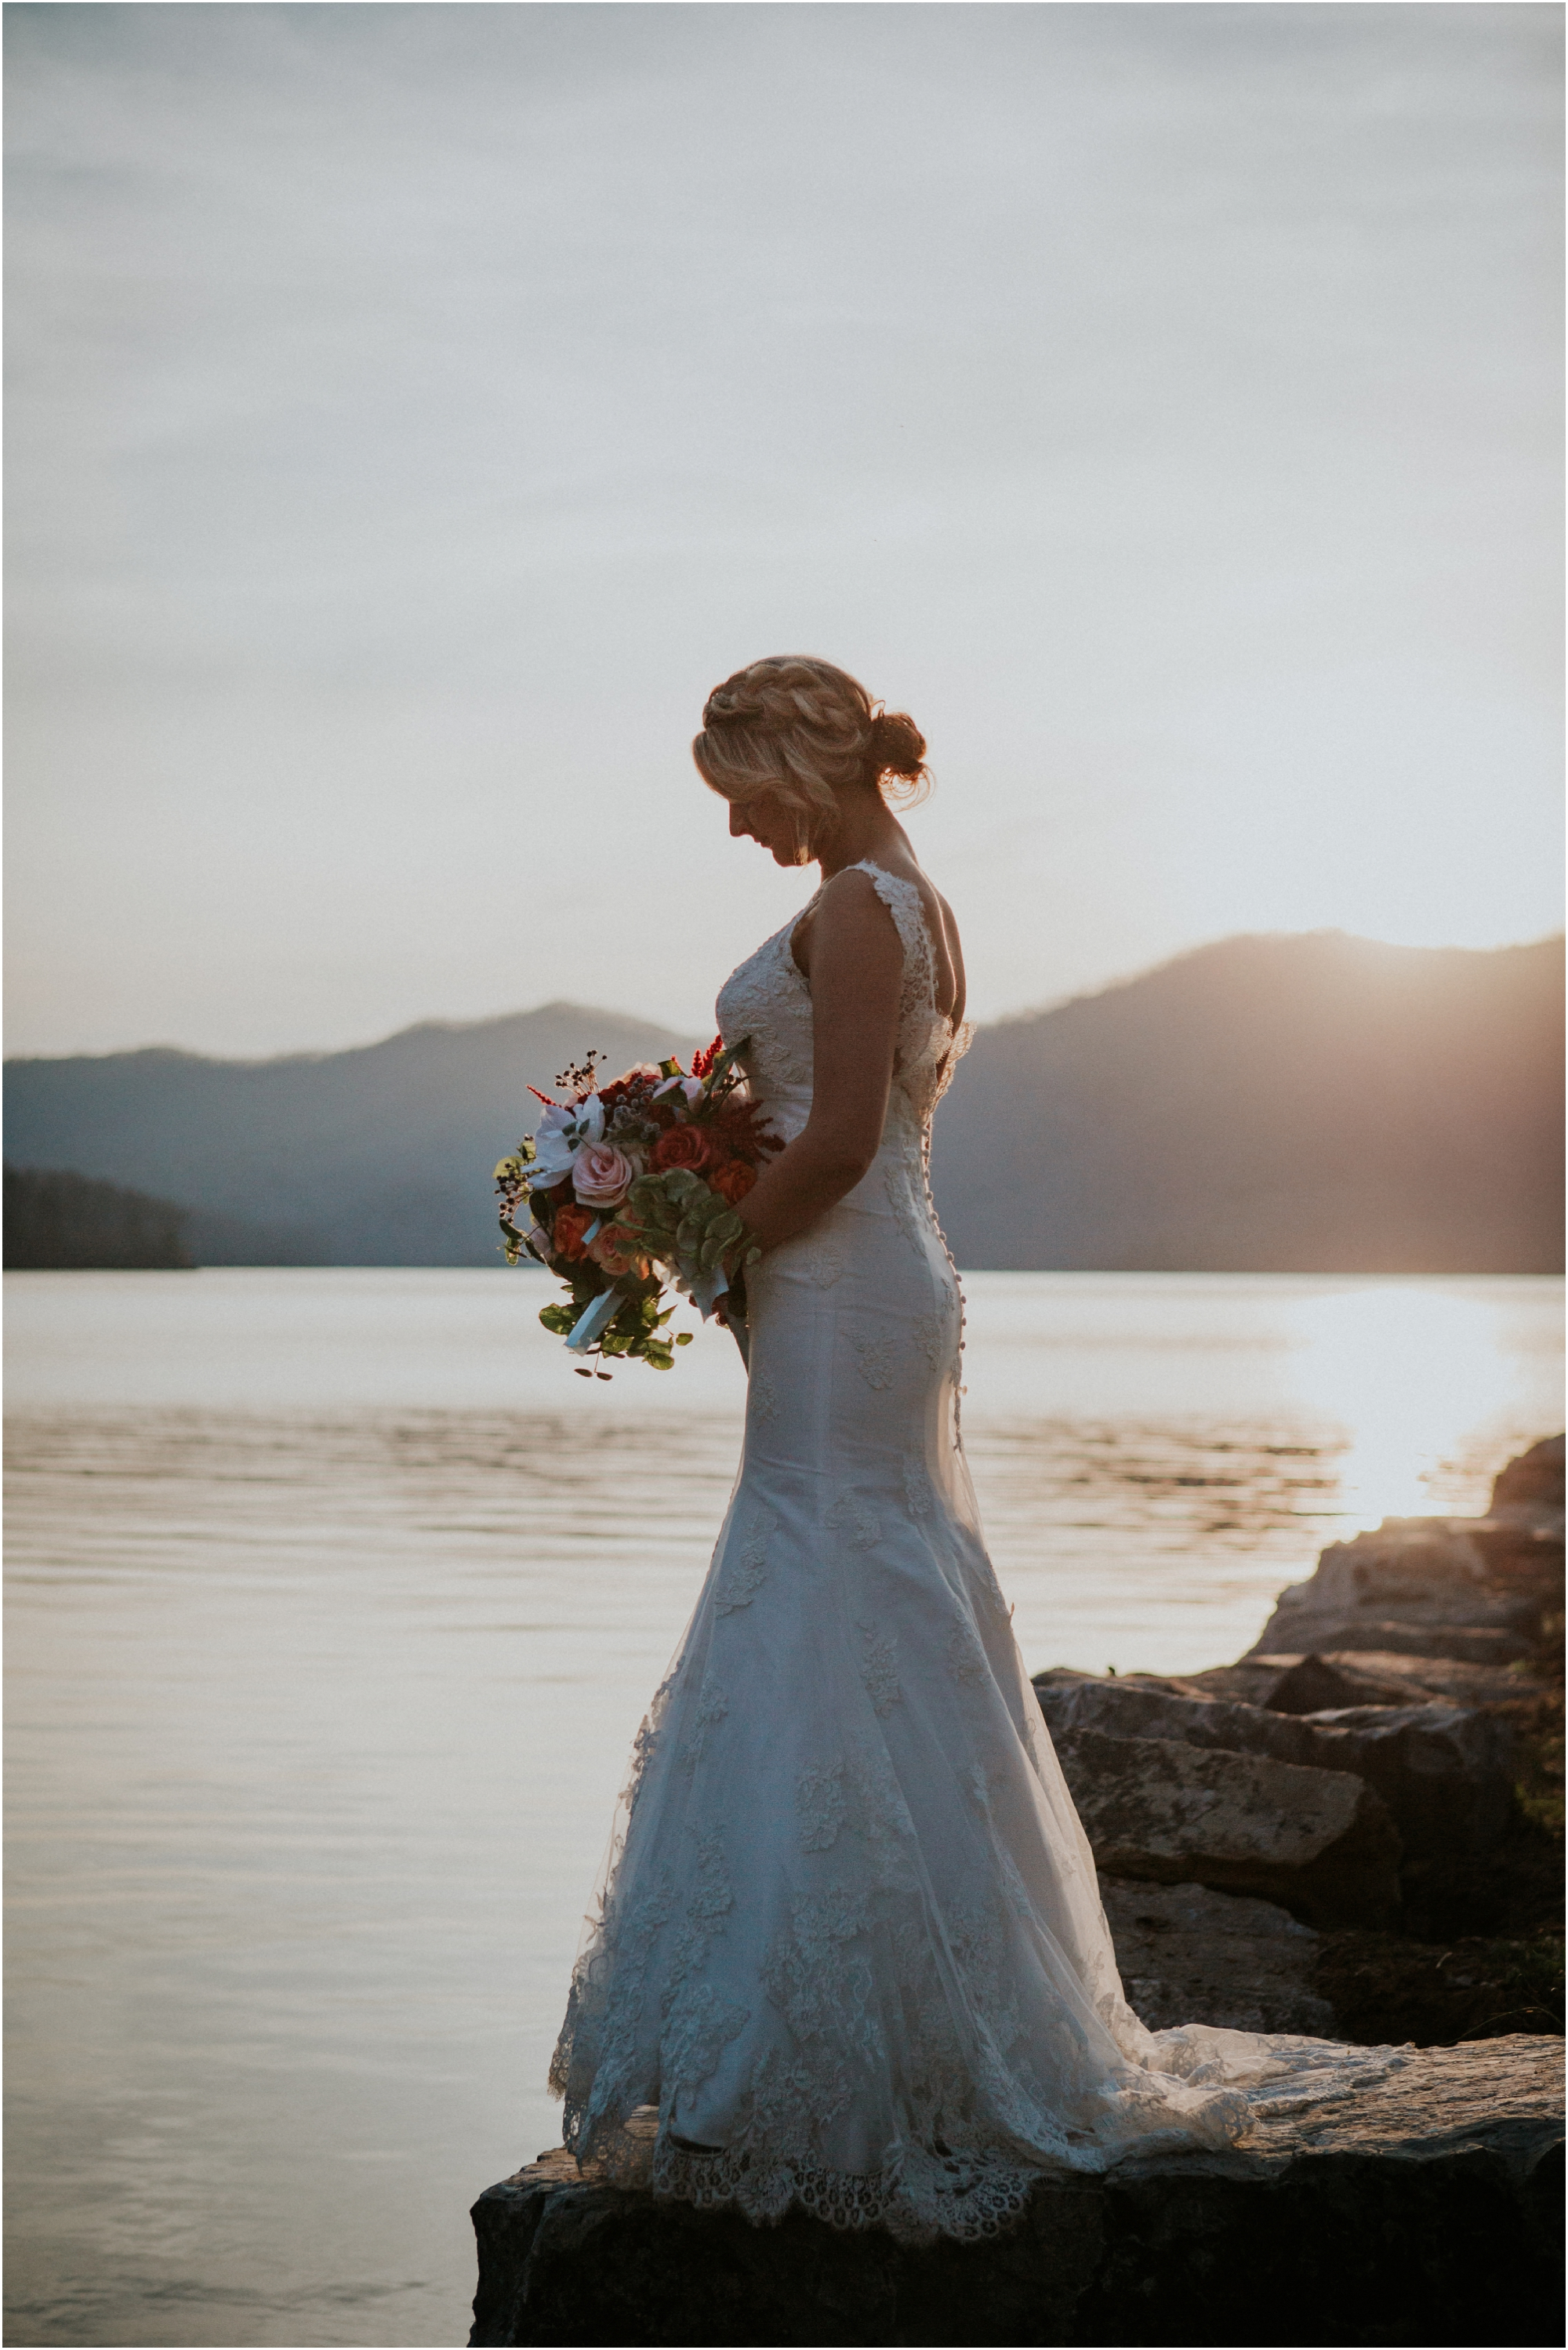 watauga-lake--bohemian-bridal-styled-session-northeast-tennessee-wedding-elopement-photography_0011.jpg